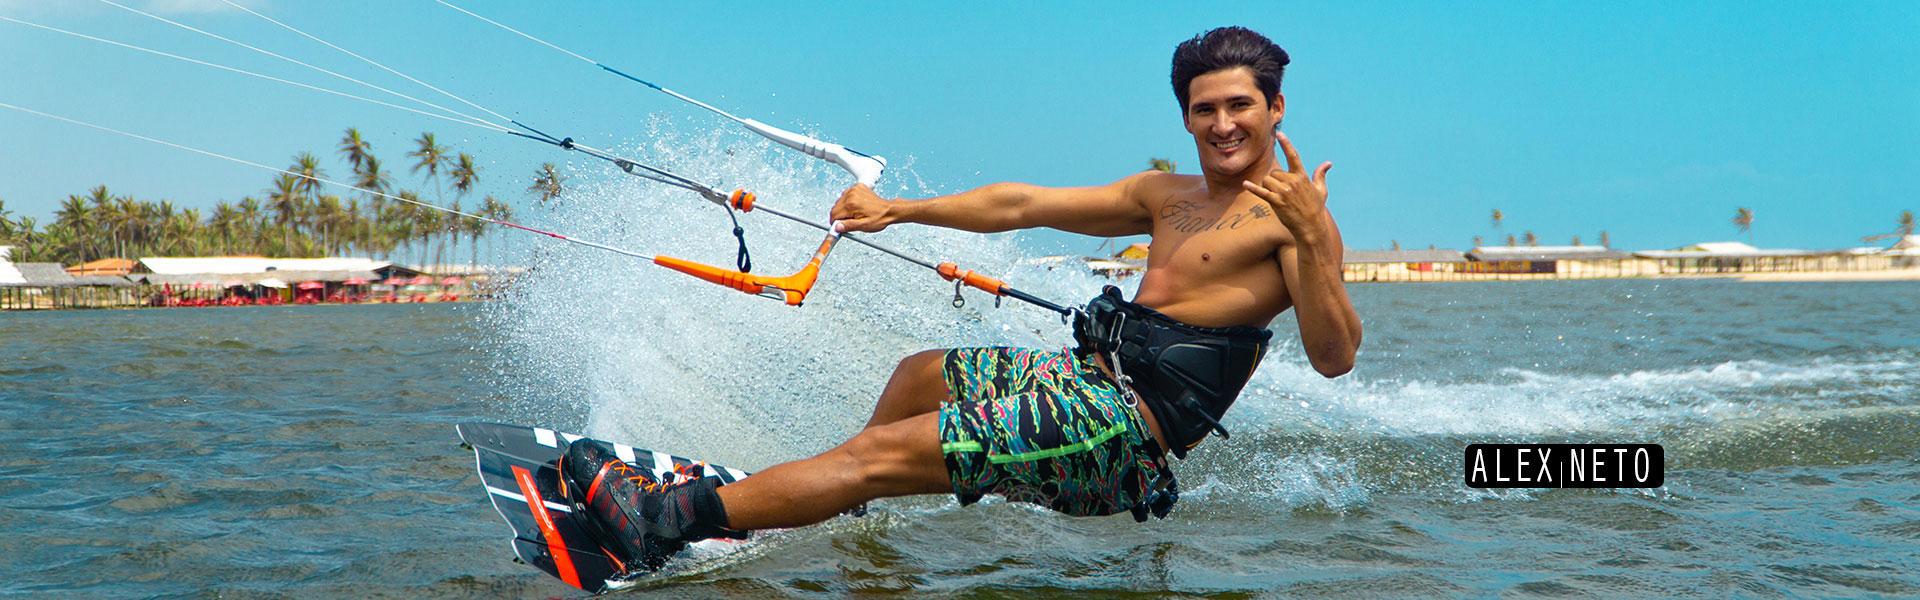 Kitesurfing Alex Neto Cumbuco